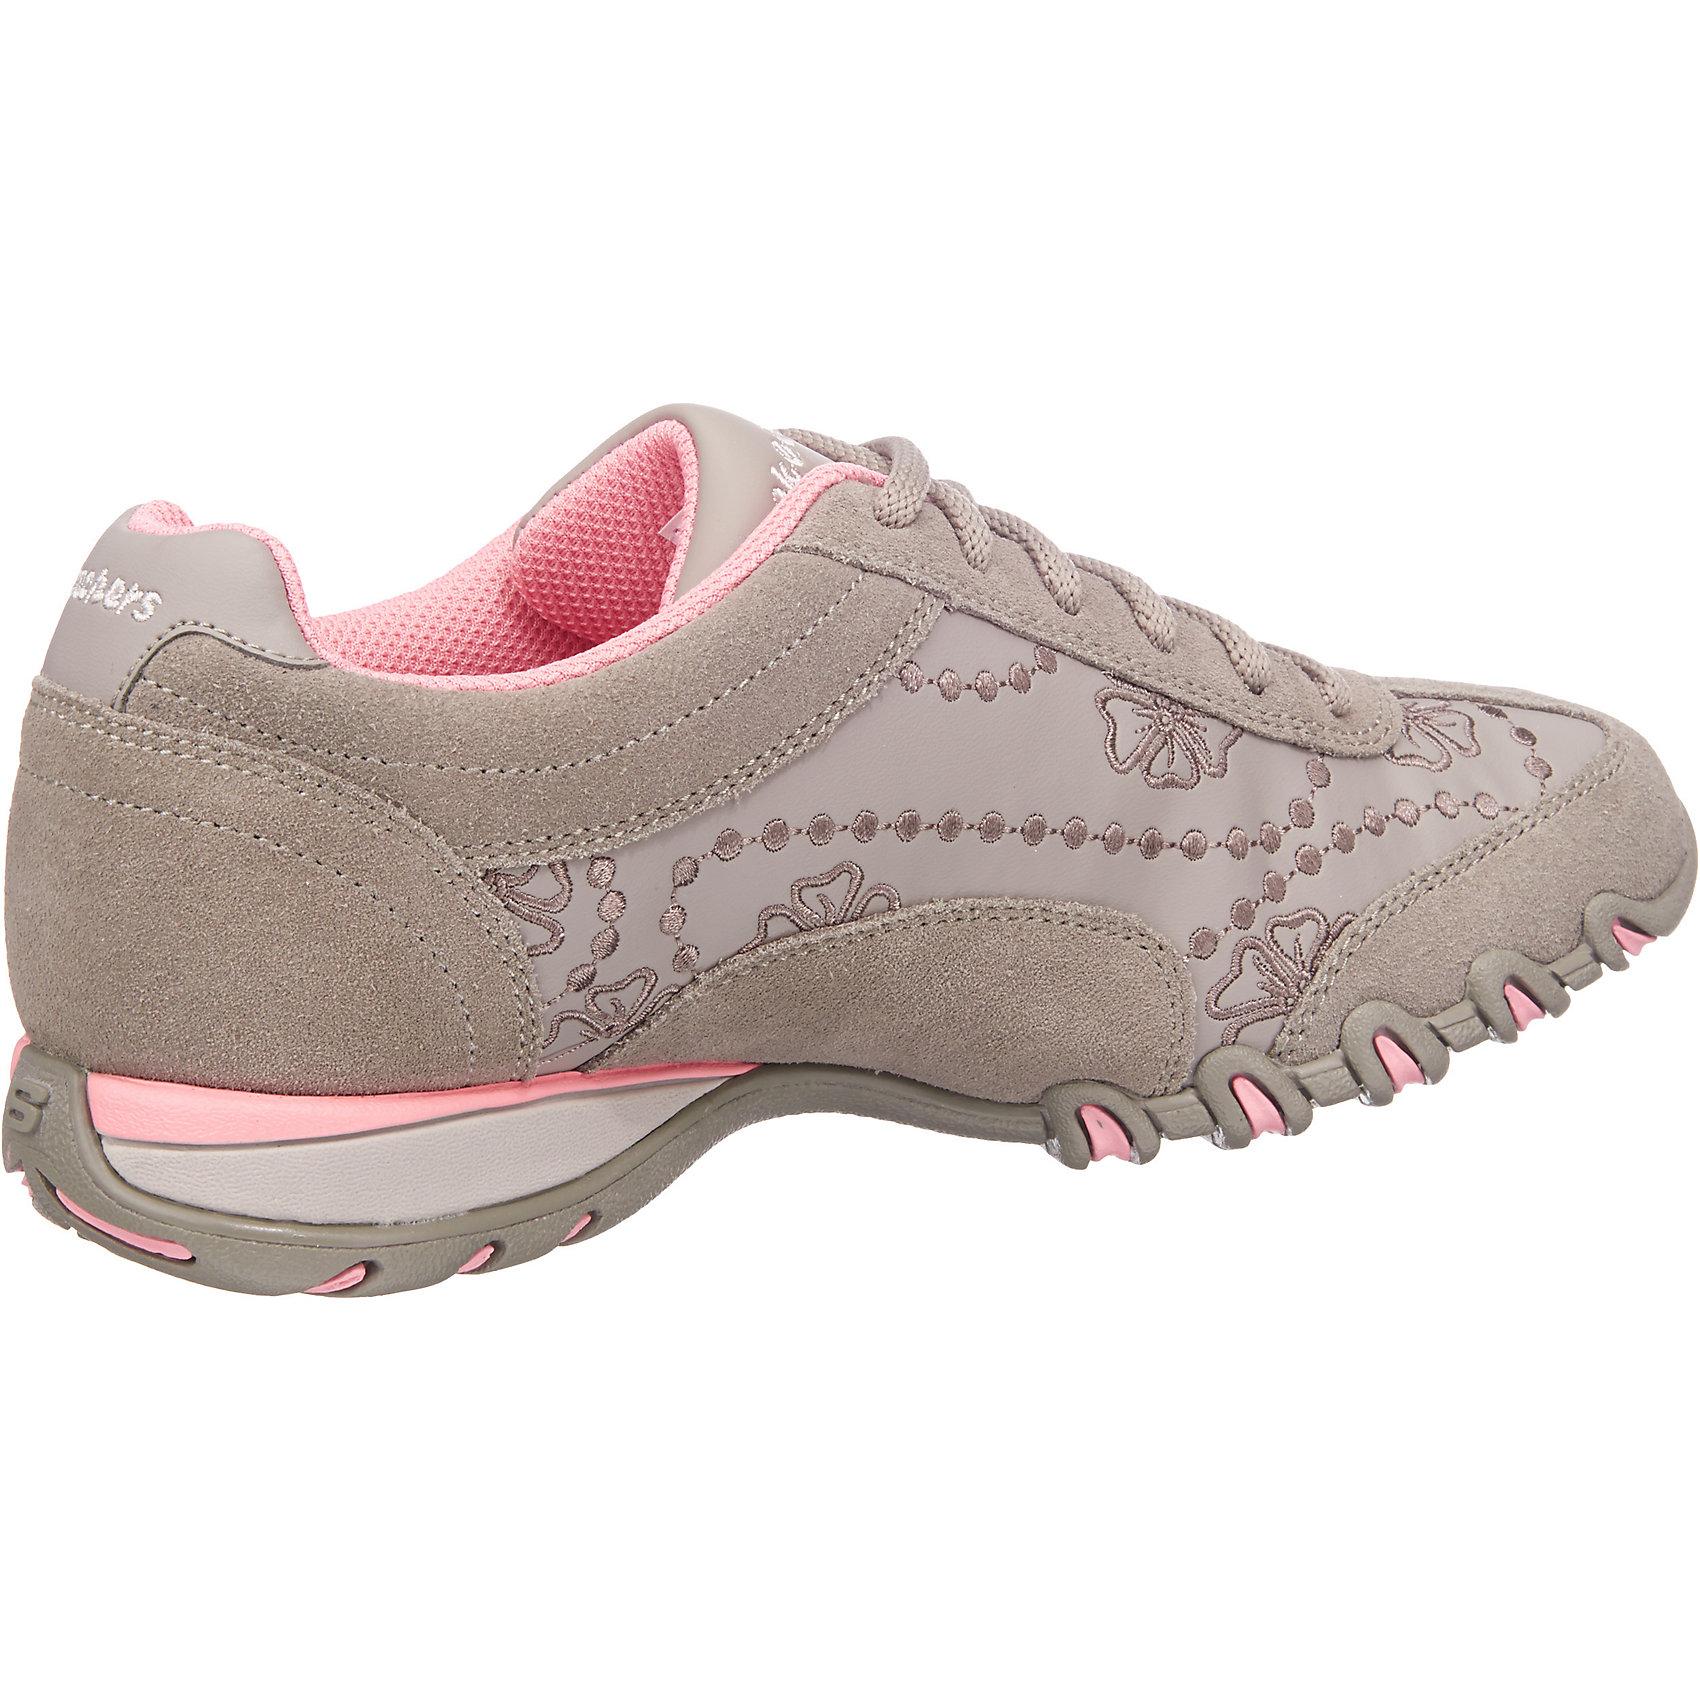 Neu SKECHERS Speedsters Speedsters Speedsters Lady Operator Sneakers Niedrig 5752748 für Damen 7ddeb1